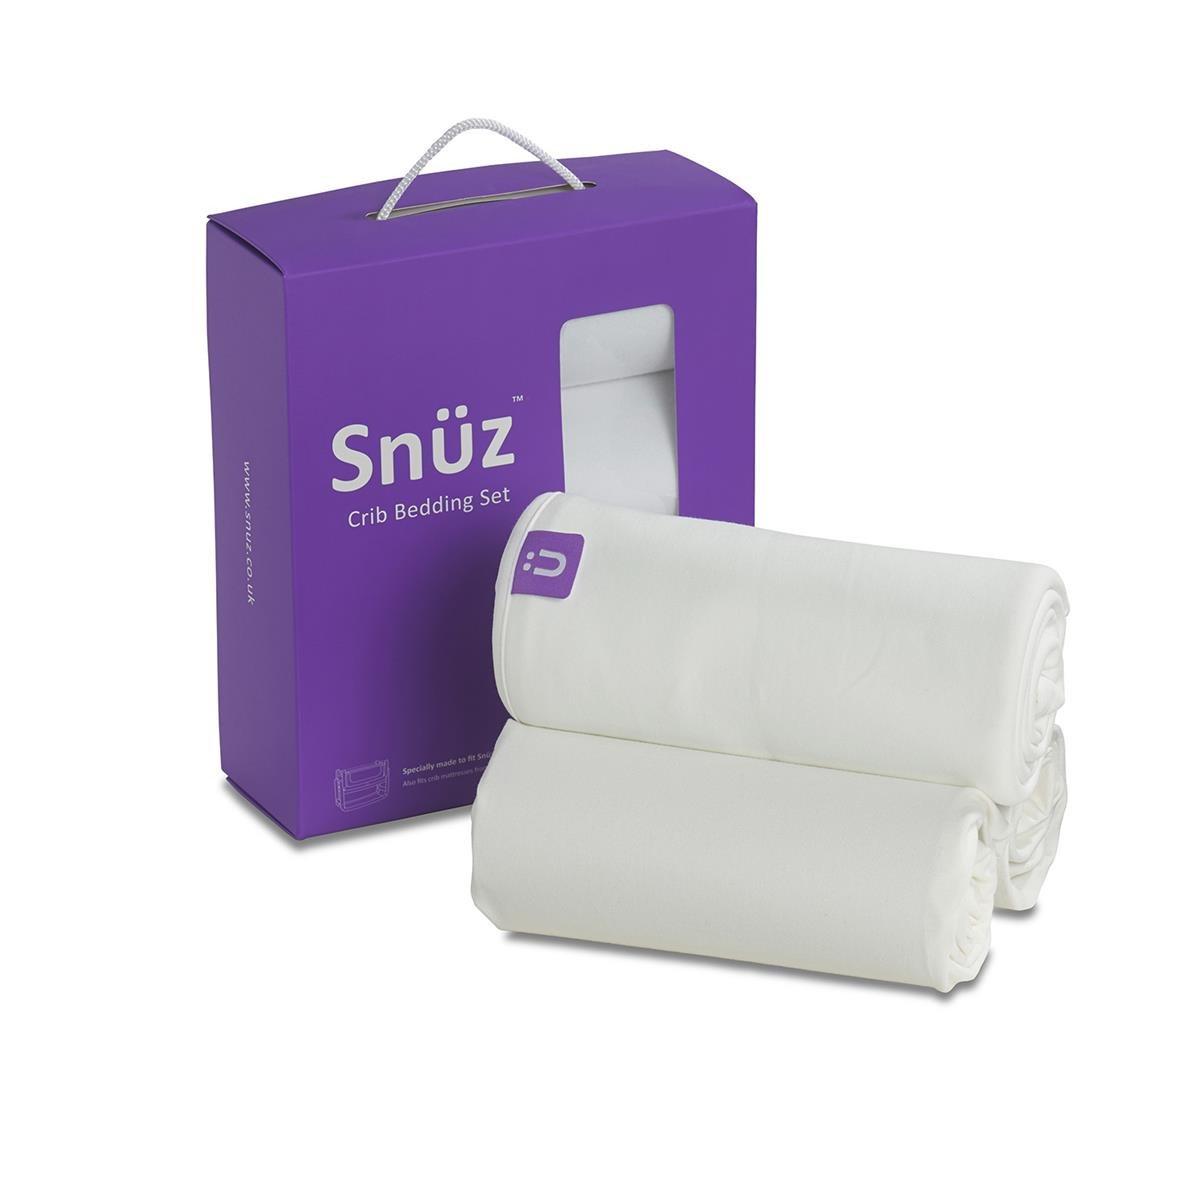 Baby crib for sale redditch - Snuzpod Crib Bedding Set White